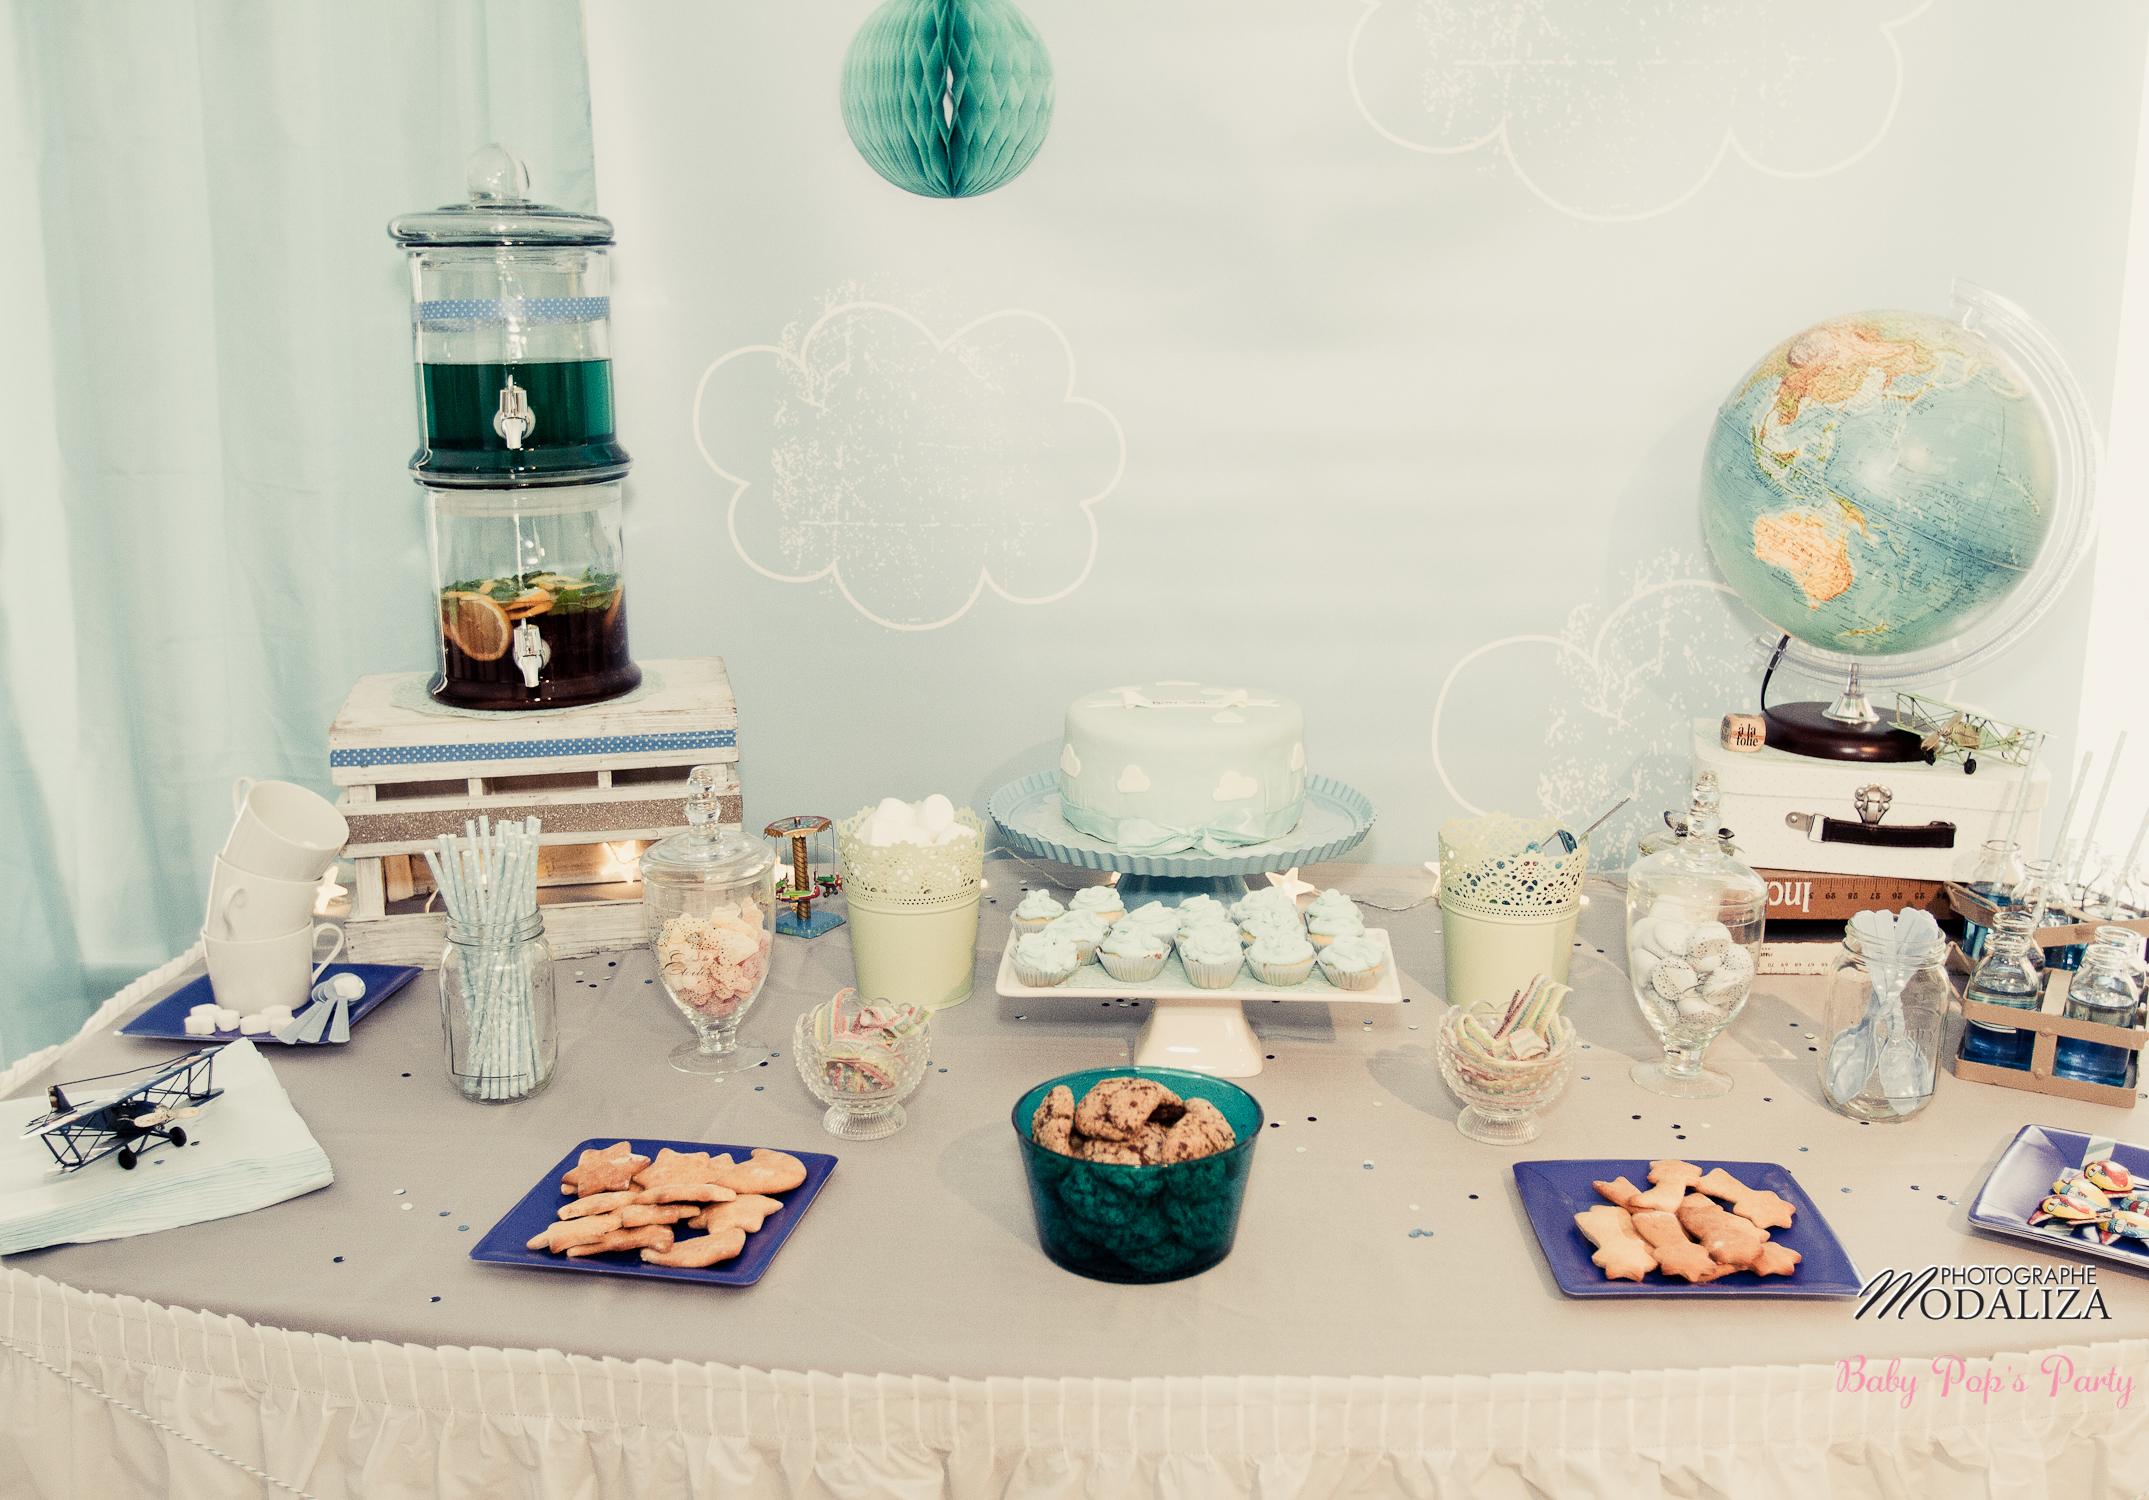 Babyshower bleu nuages baby pop's party by modaliza photographe-6885